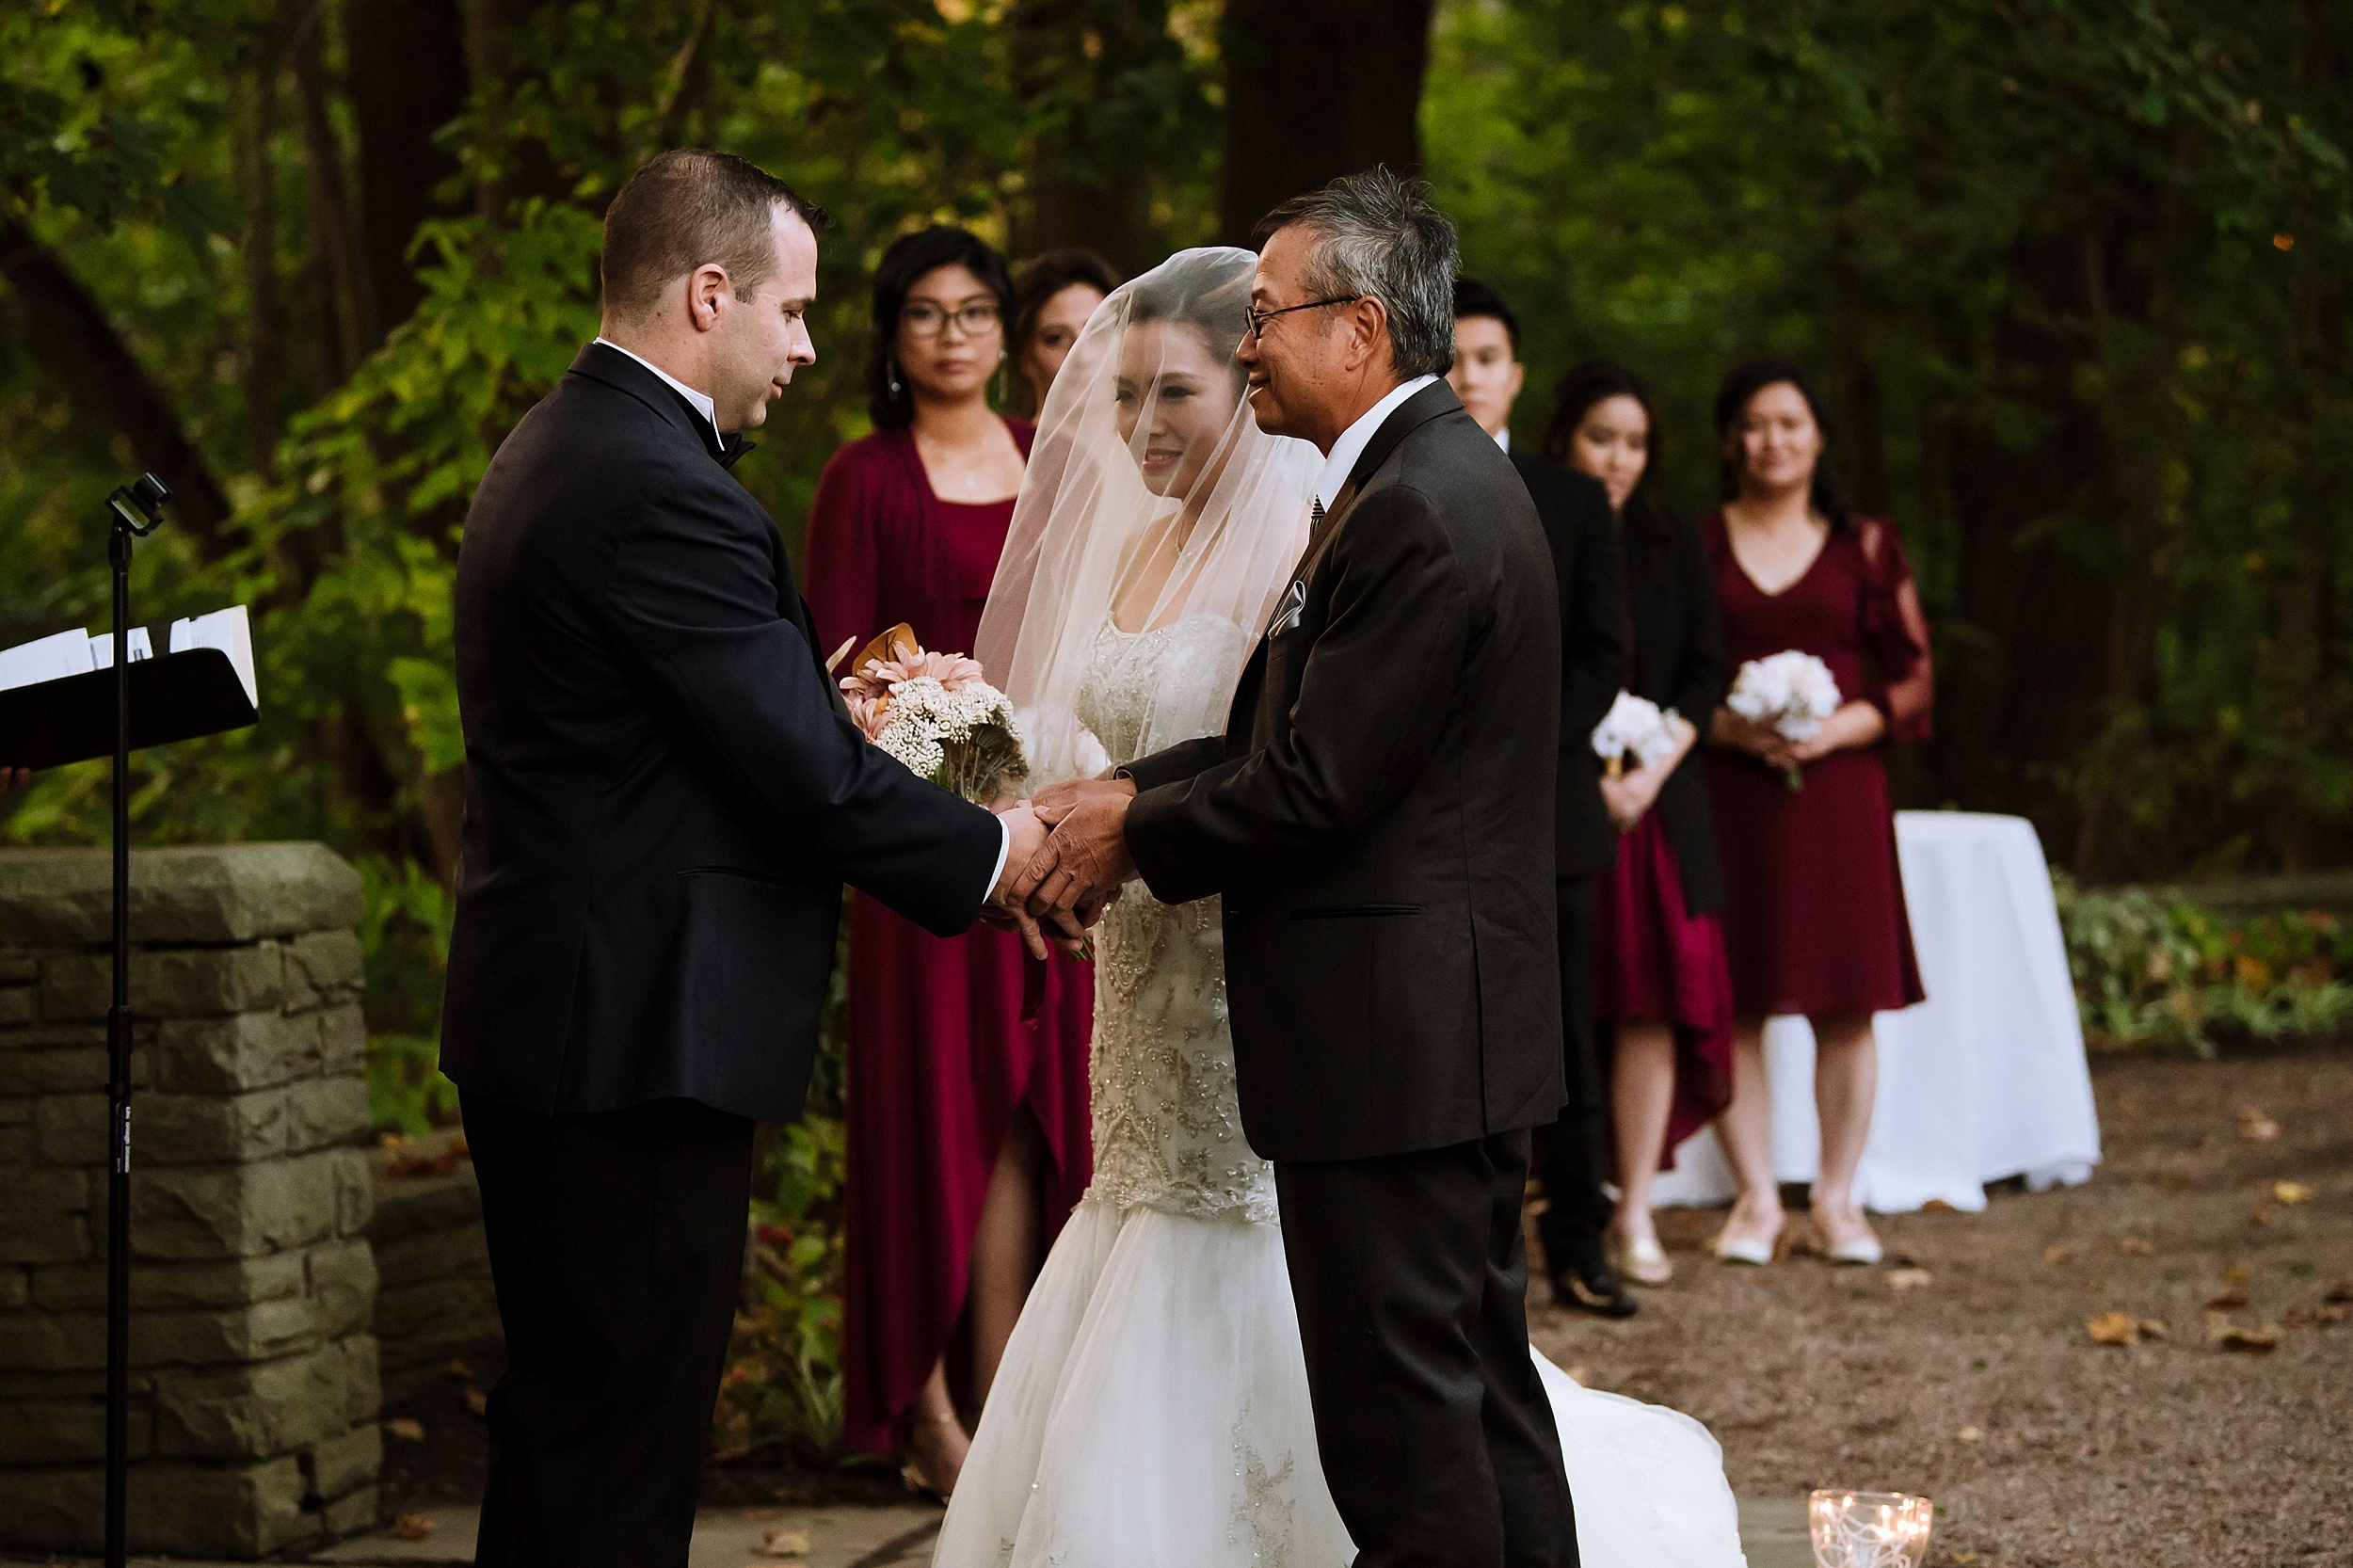 Sunnybrook_Estates_Alexander_Muir_Toronto_Wedding_Photographer_0050.jpg